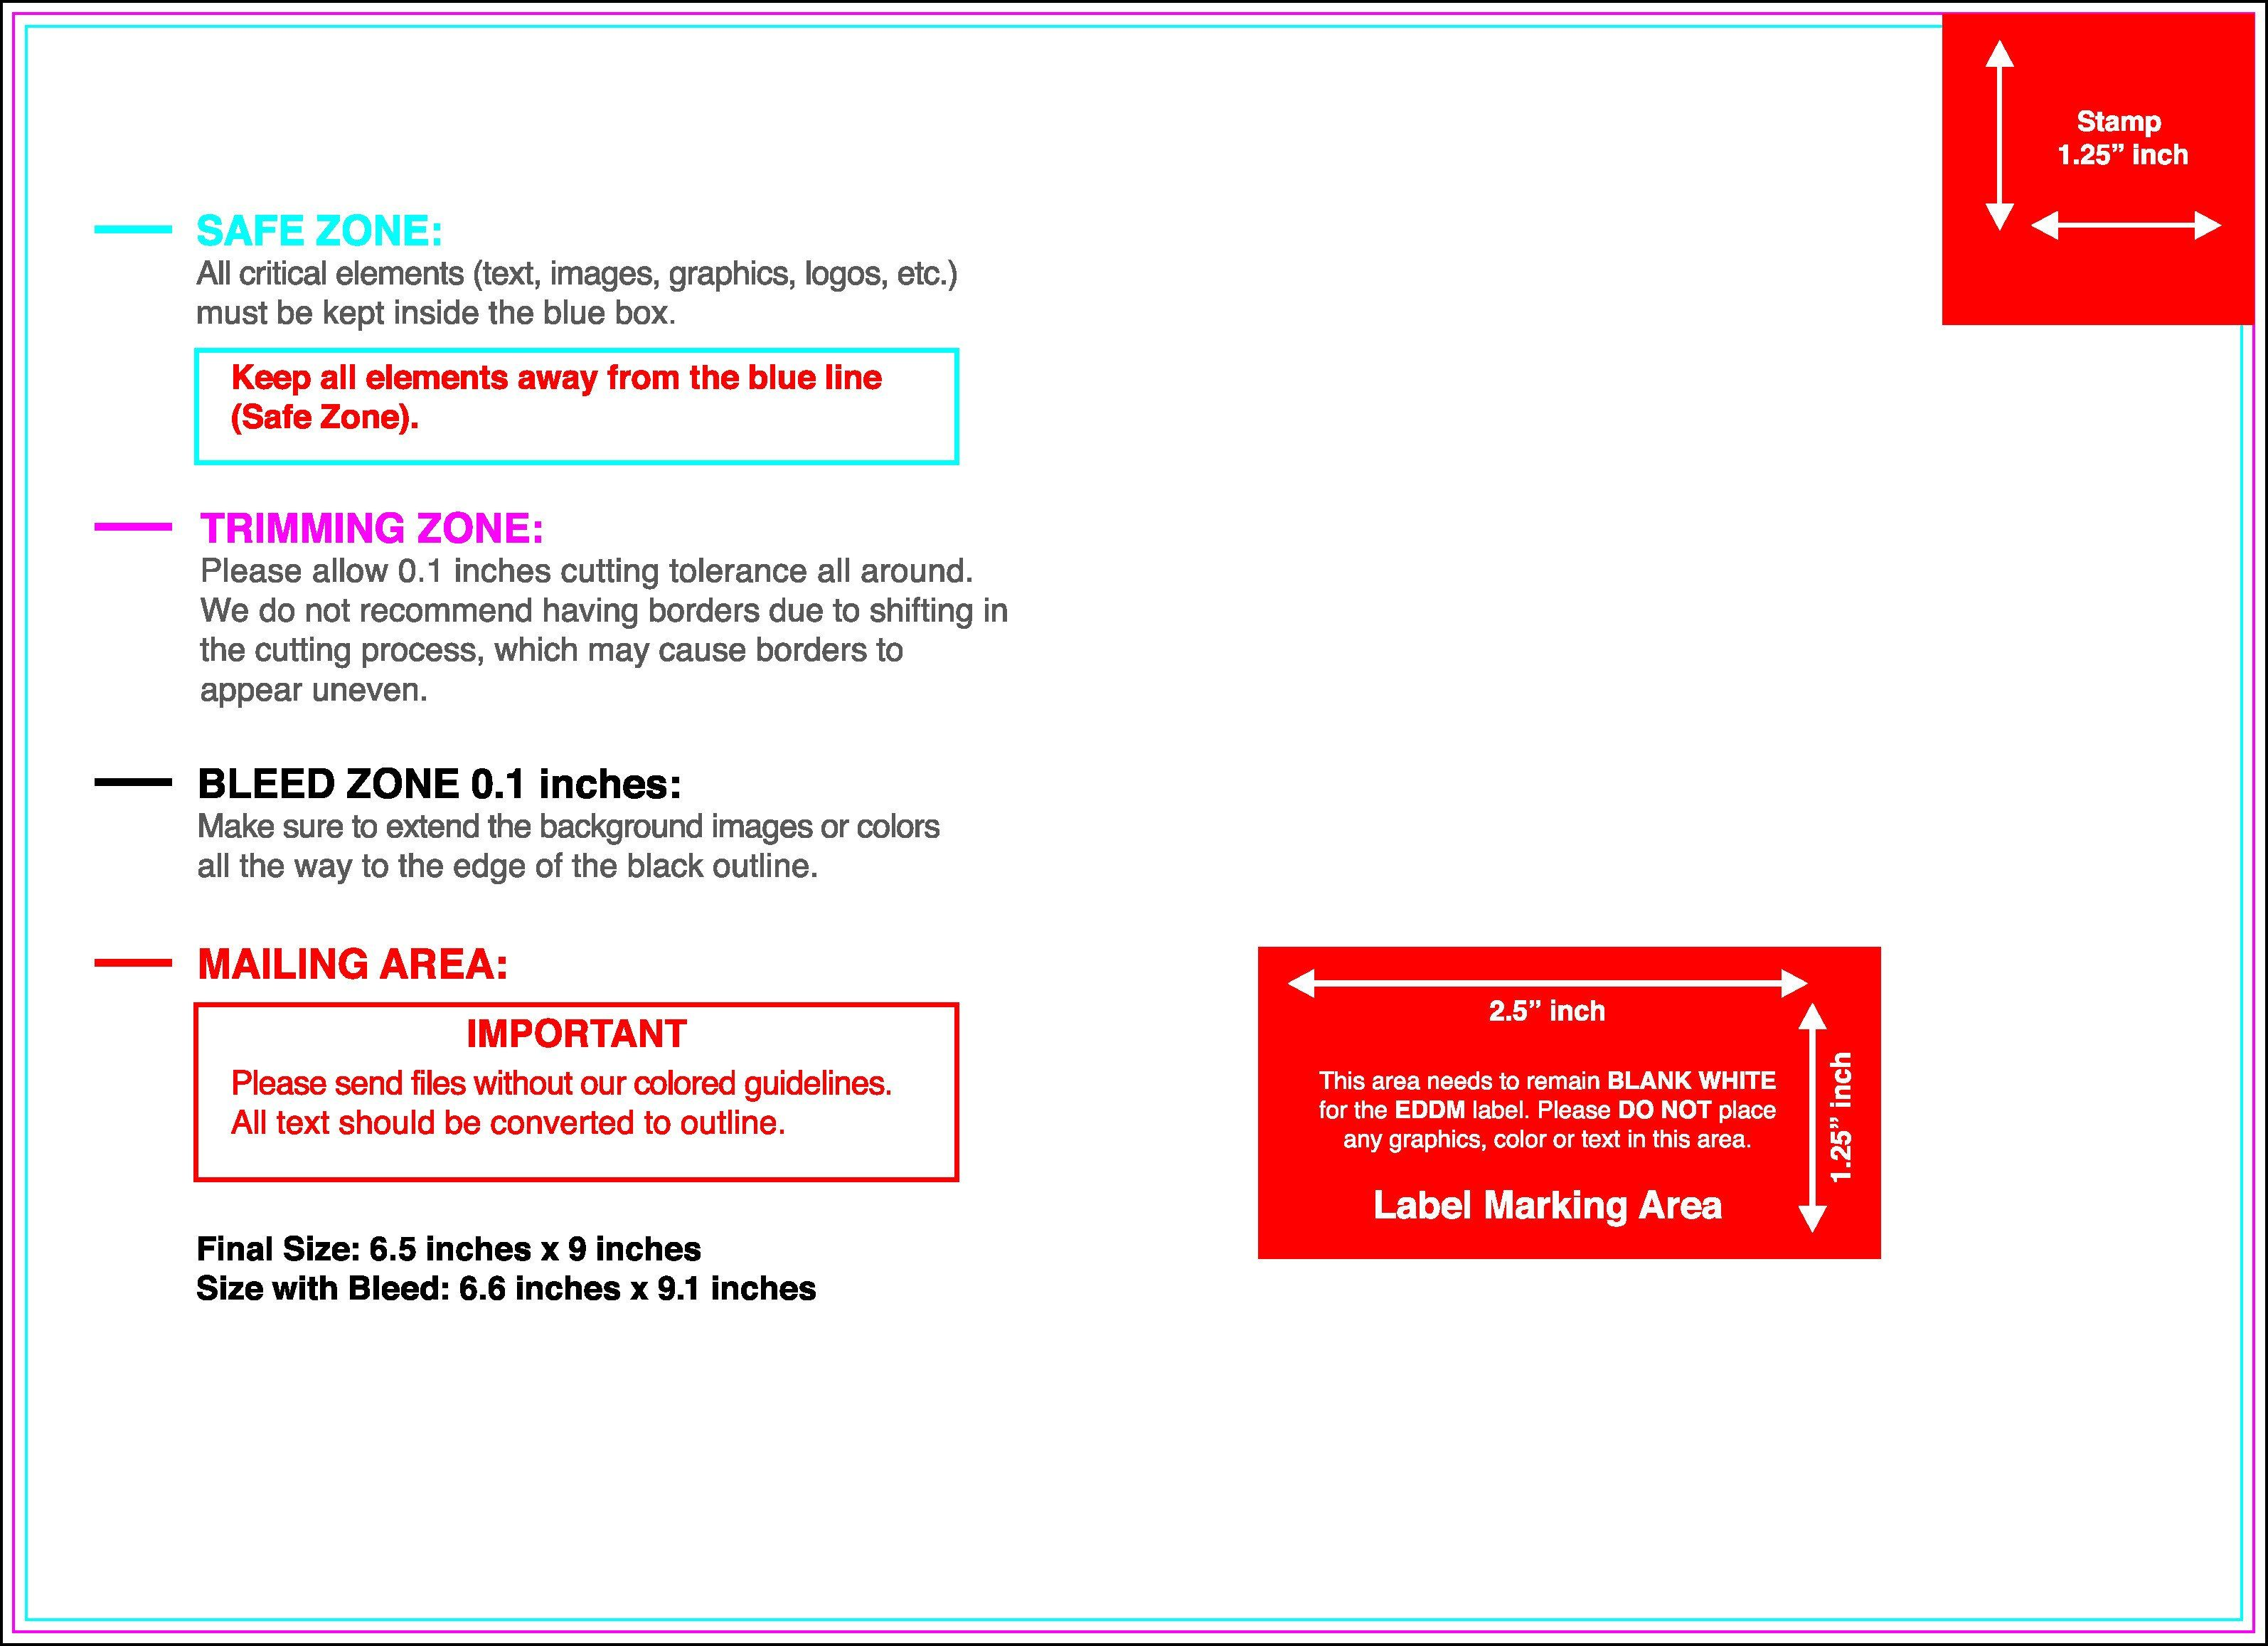 6 X 9 Postcard Template Cutthroat Printprint Your Postcards At Cutthroat Print Postcard Template Postcard Template Free Printing Business Cards